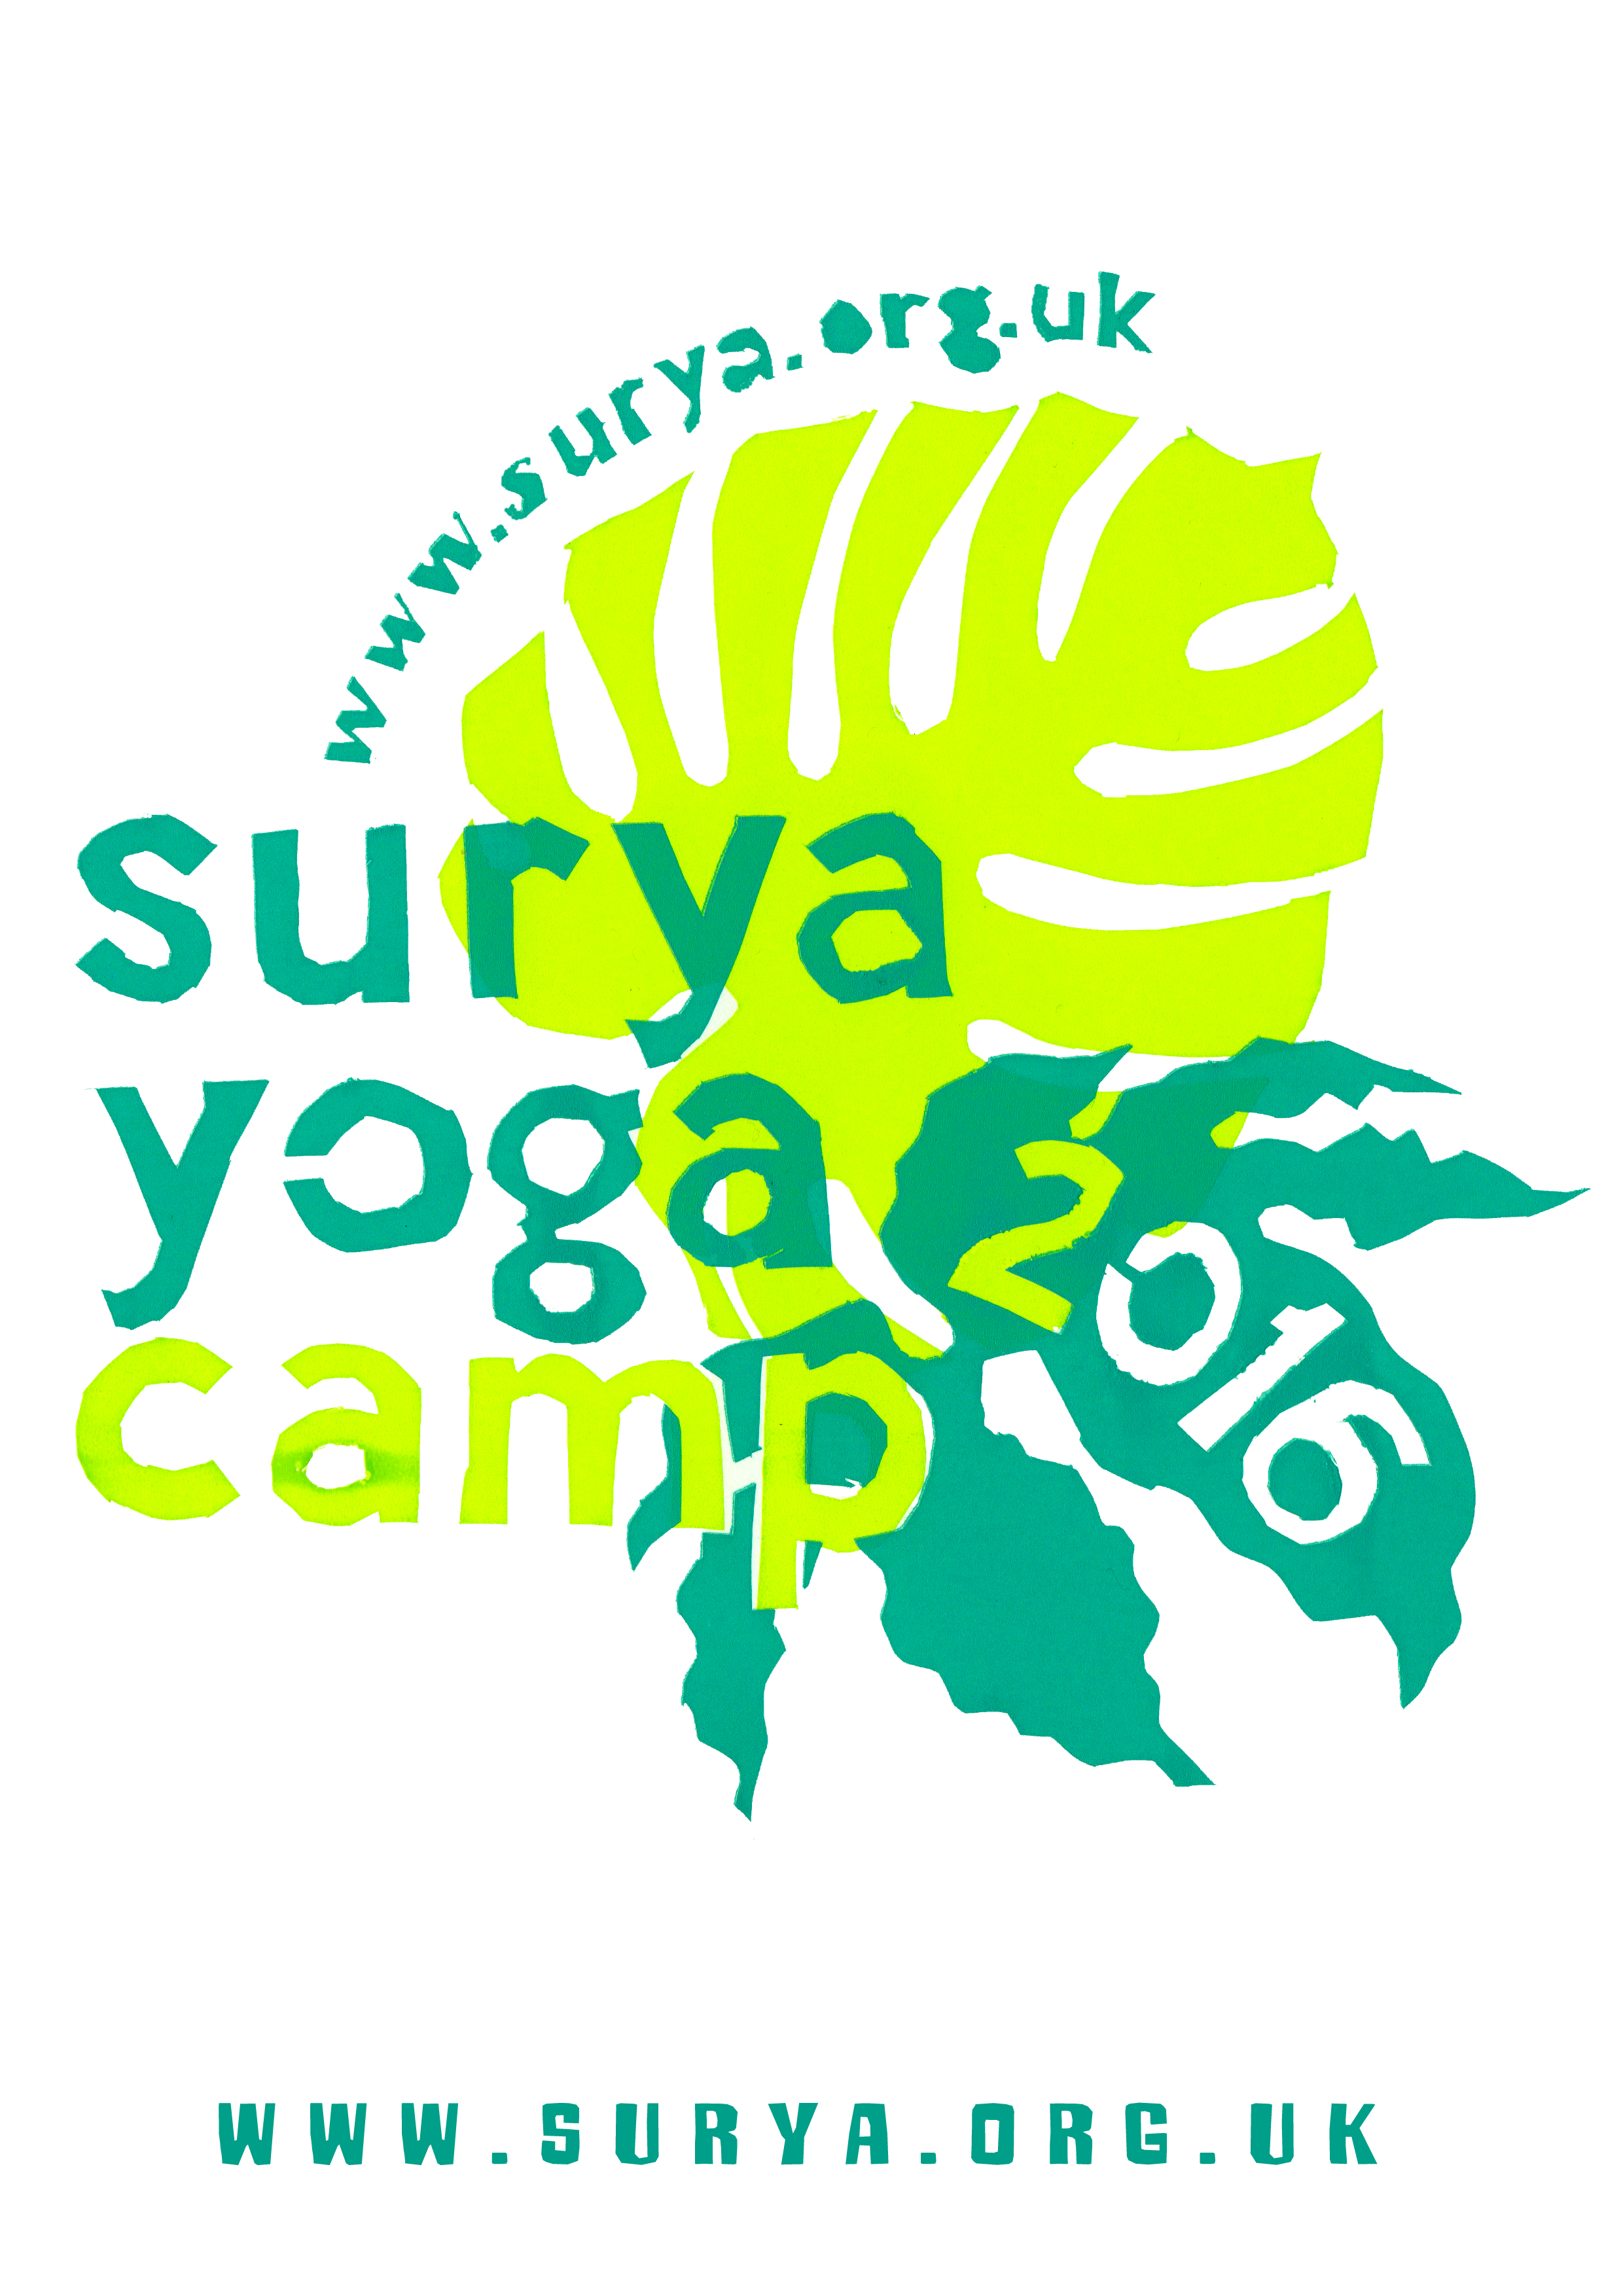 Surya postcard front 2016.jpg